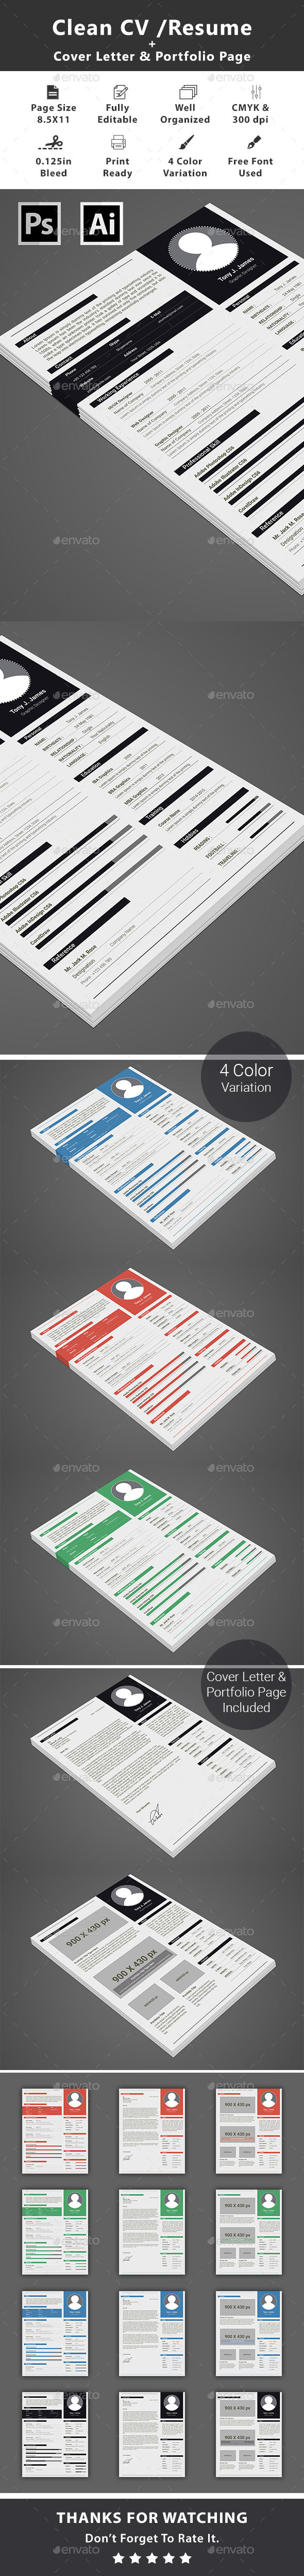 GraphicRiver Clean CV Resume 20603665